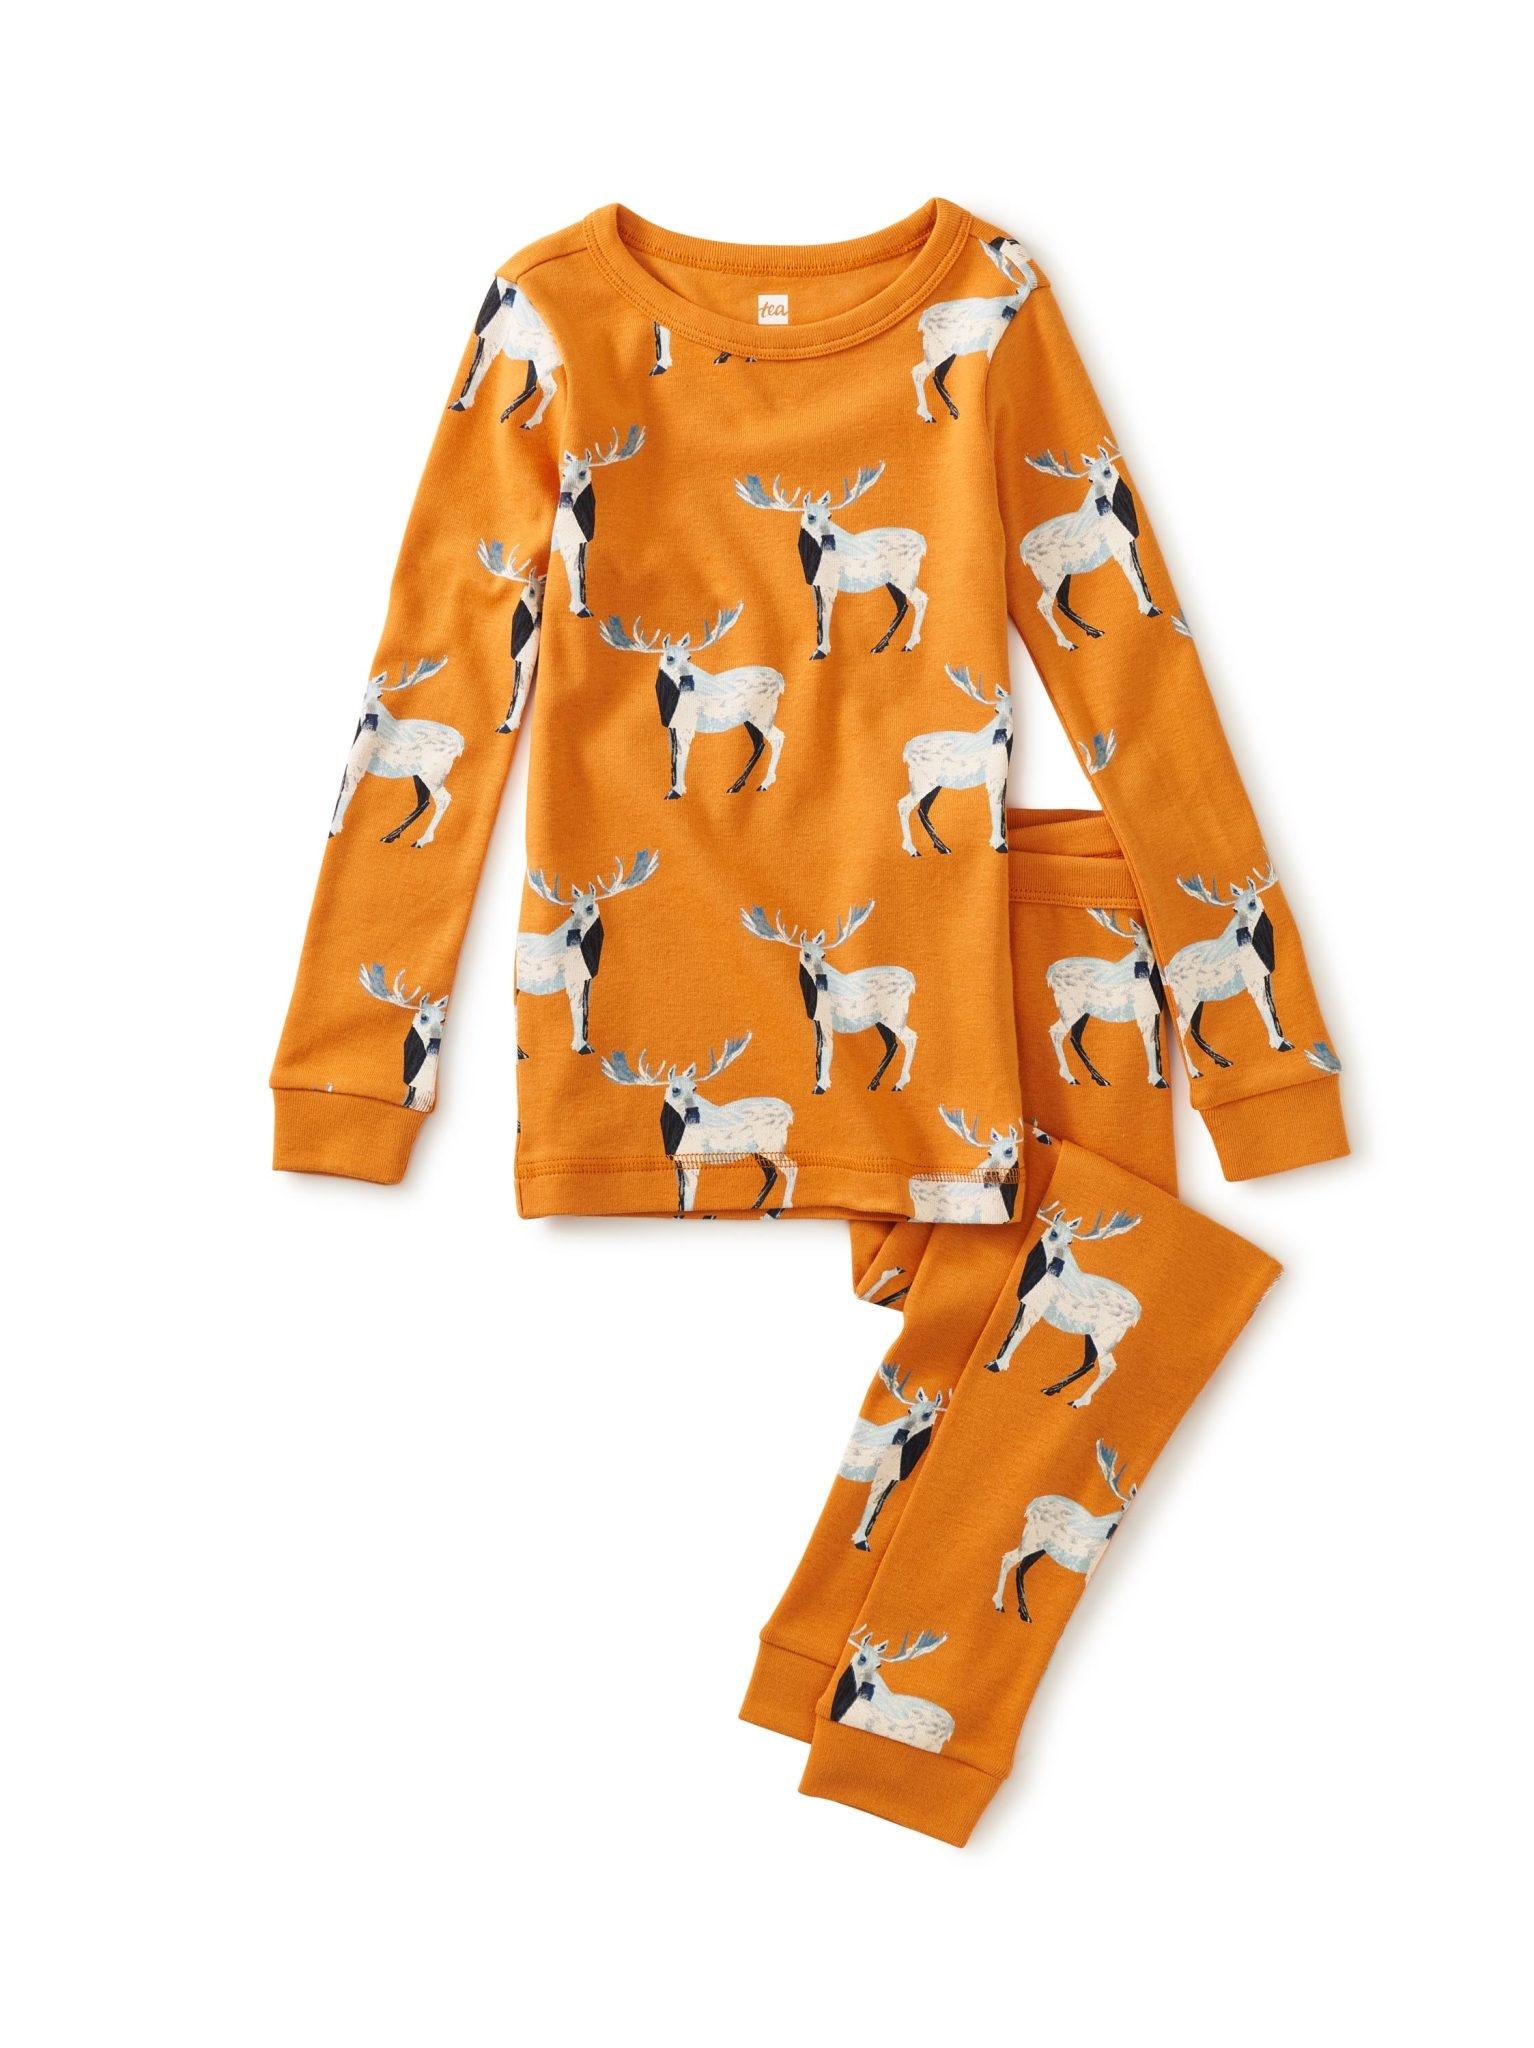 Tea Collection White Moose Pajamas